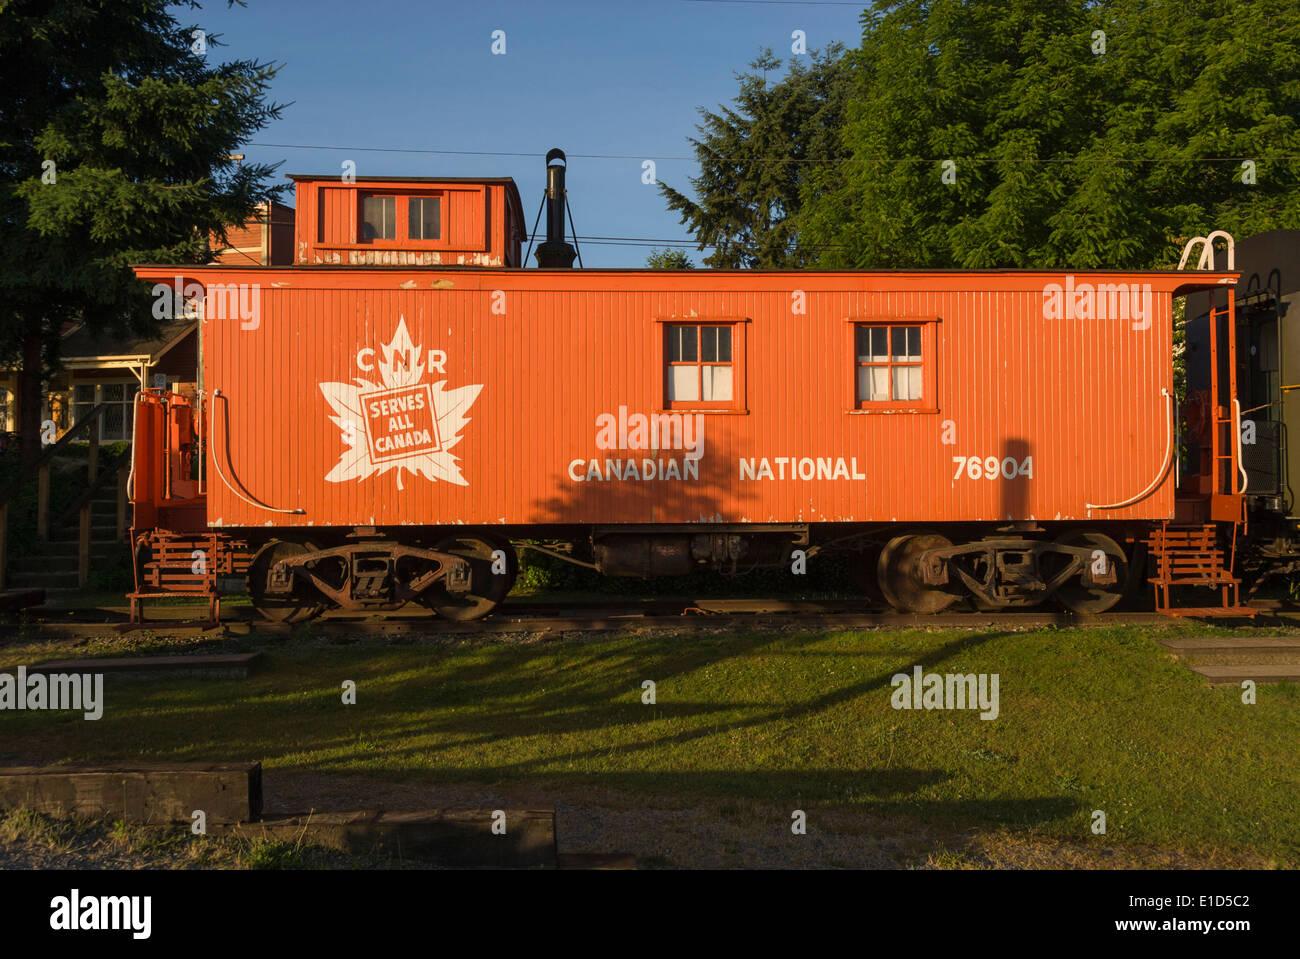 Elk203-1343 Canada, British Columbia, Fort Langley, train station - Stock Image